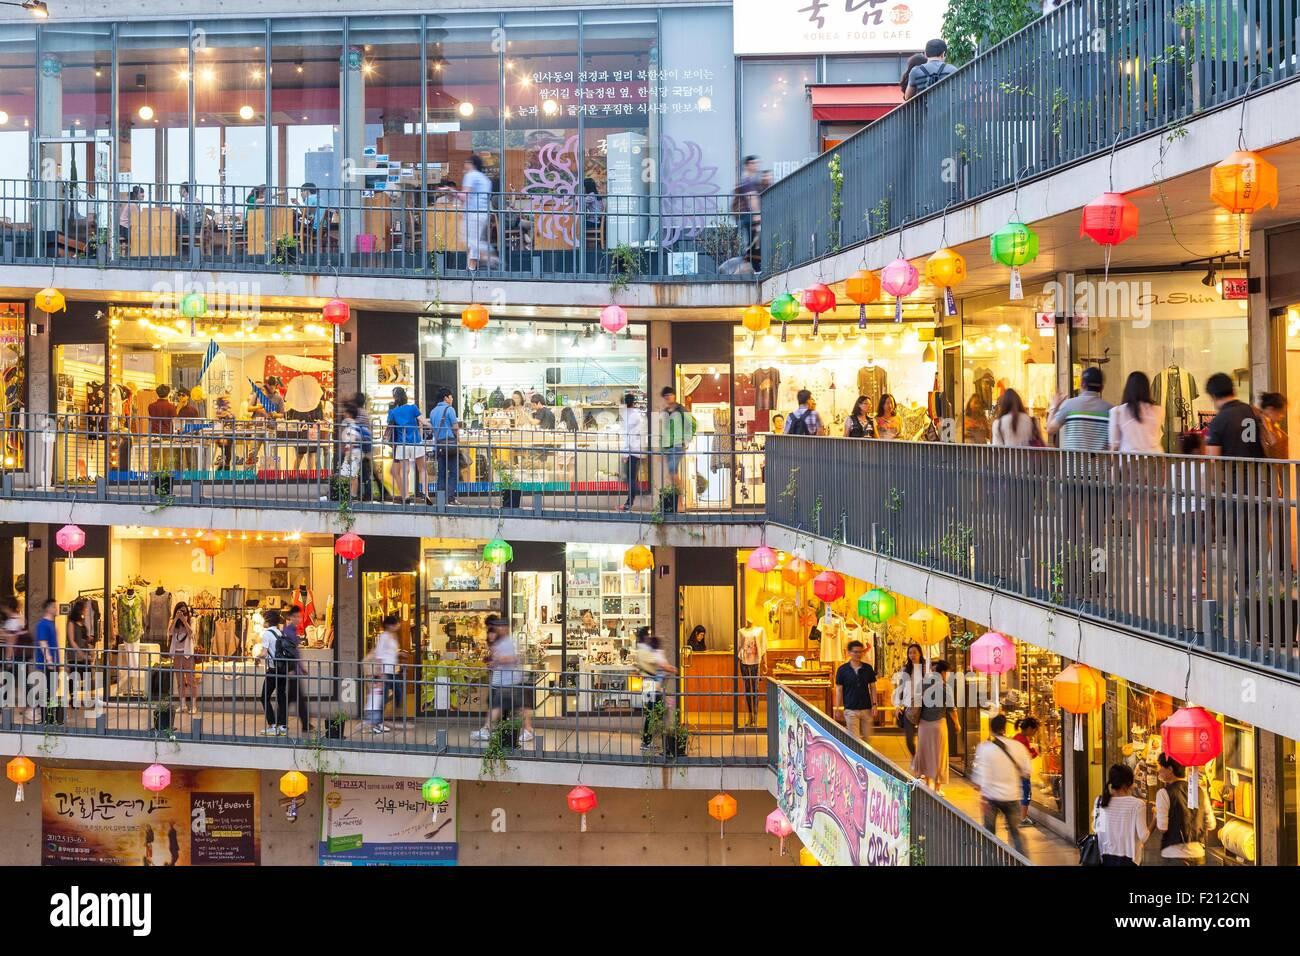 South Korea, Seoul, Jongno-gu, Insadong neighborhood, Ssamziegil mall opened in 2004 Stock Photo